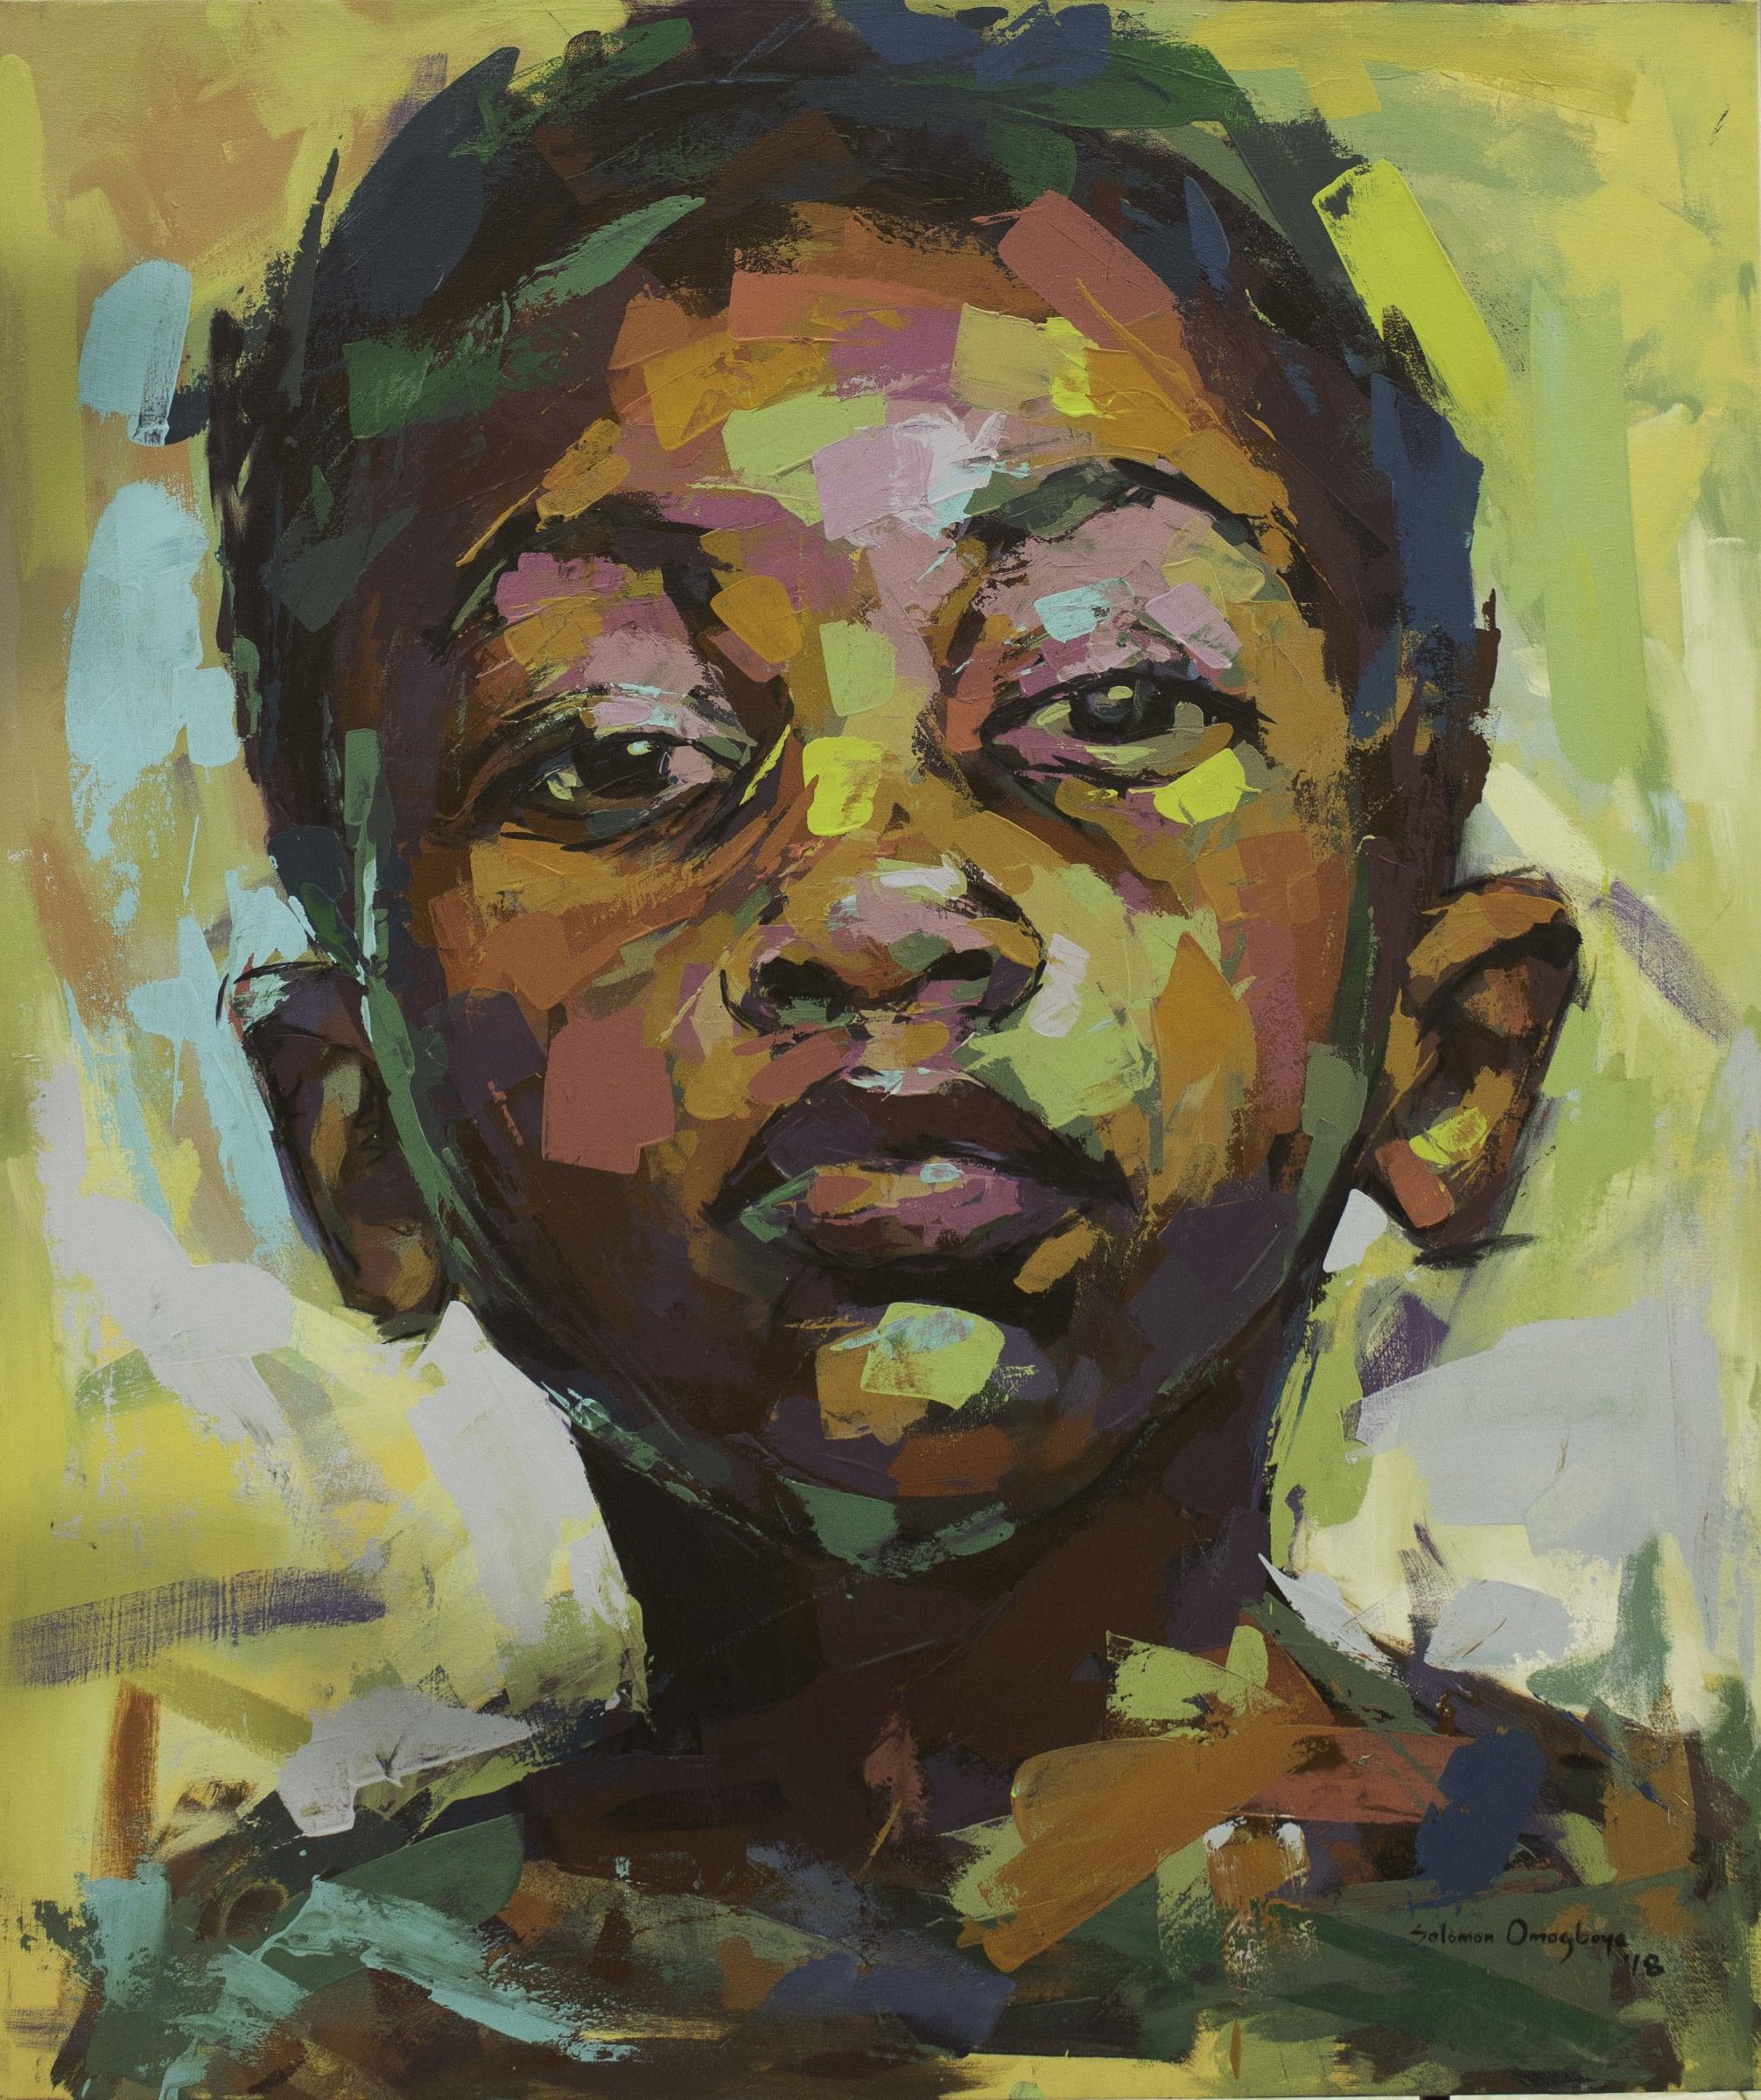 <span class=&#34;link fancybox-details-link&#34;><a href=&#34;/artworks/293-solomon-omogboye-purity-2018/&#34;>View Detail Page</a></span><div class=&#34;artist&#34;><strong>Solomon Omogboye</strong></div> <div class=&#34;title&#34;><em>Purity</em>, 2018</div> <div class=&#34;medium&#34;>Acrylic On Canvas</div> <div class=&#34;dimensions&#34;>101cm x 119.3cm</div><div class=&#34;price&#34;>R23,000.00</div>